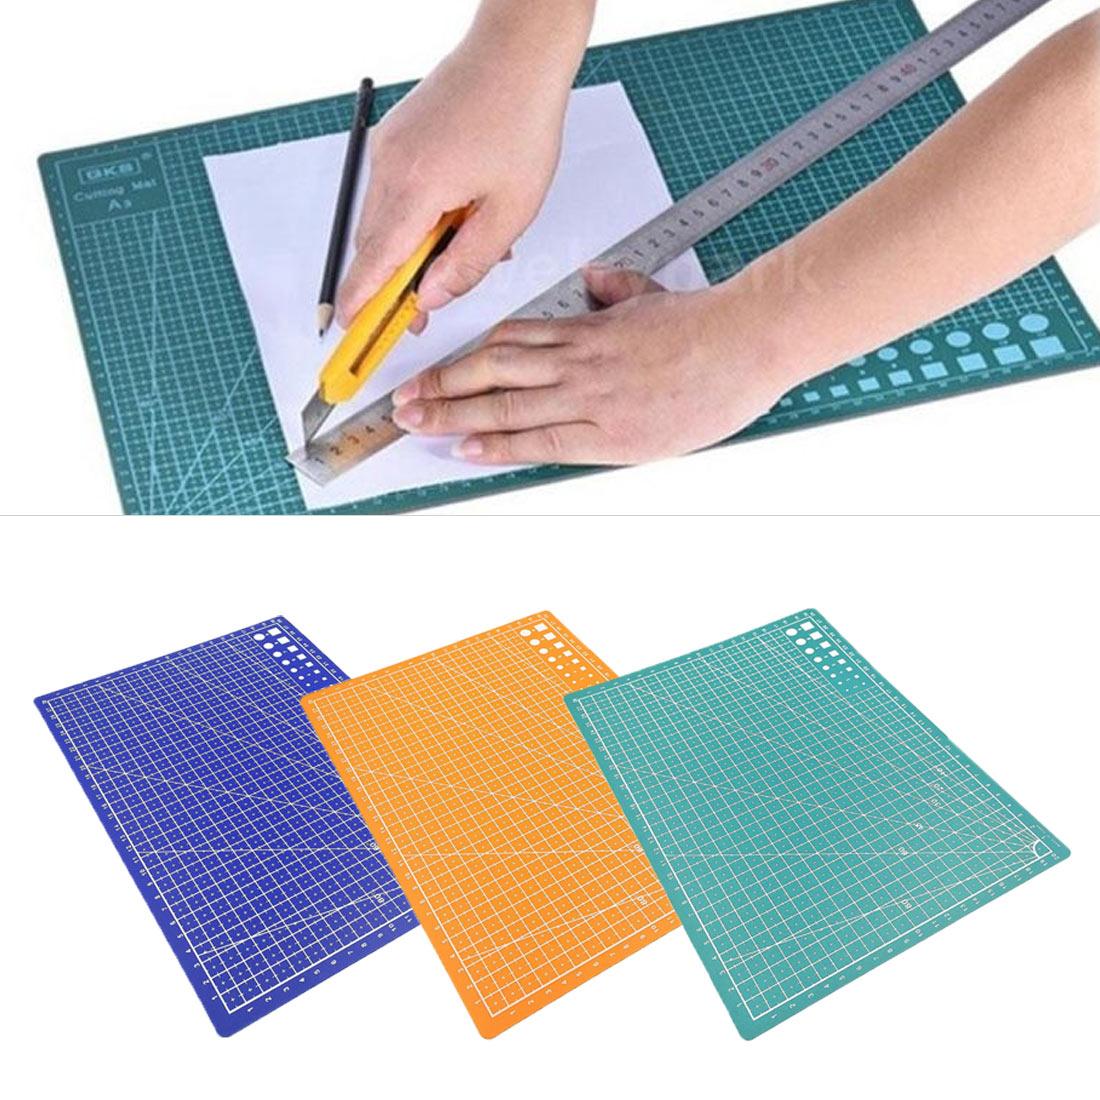 1PC A4 Grid Line Self-healing Cutting Pad Craft Card Cloth Leather Cardboard Sewing Tool